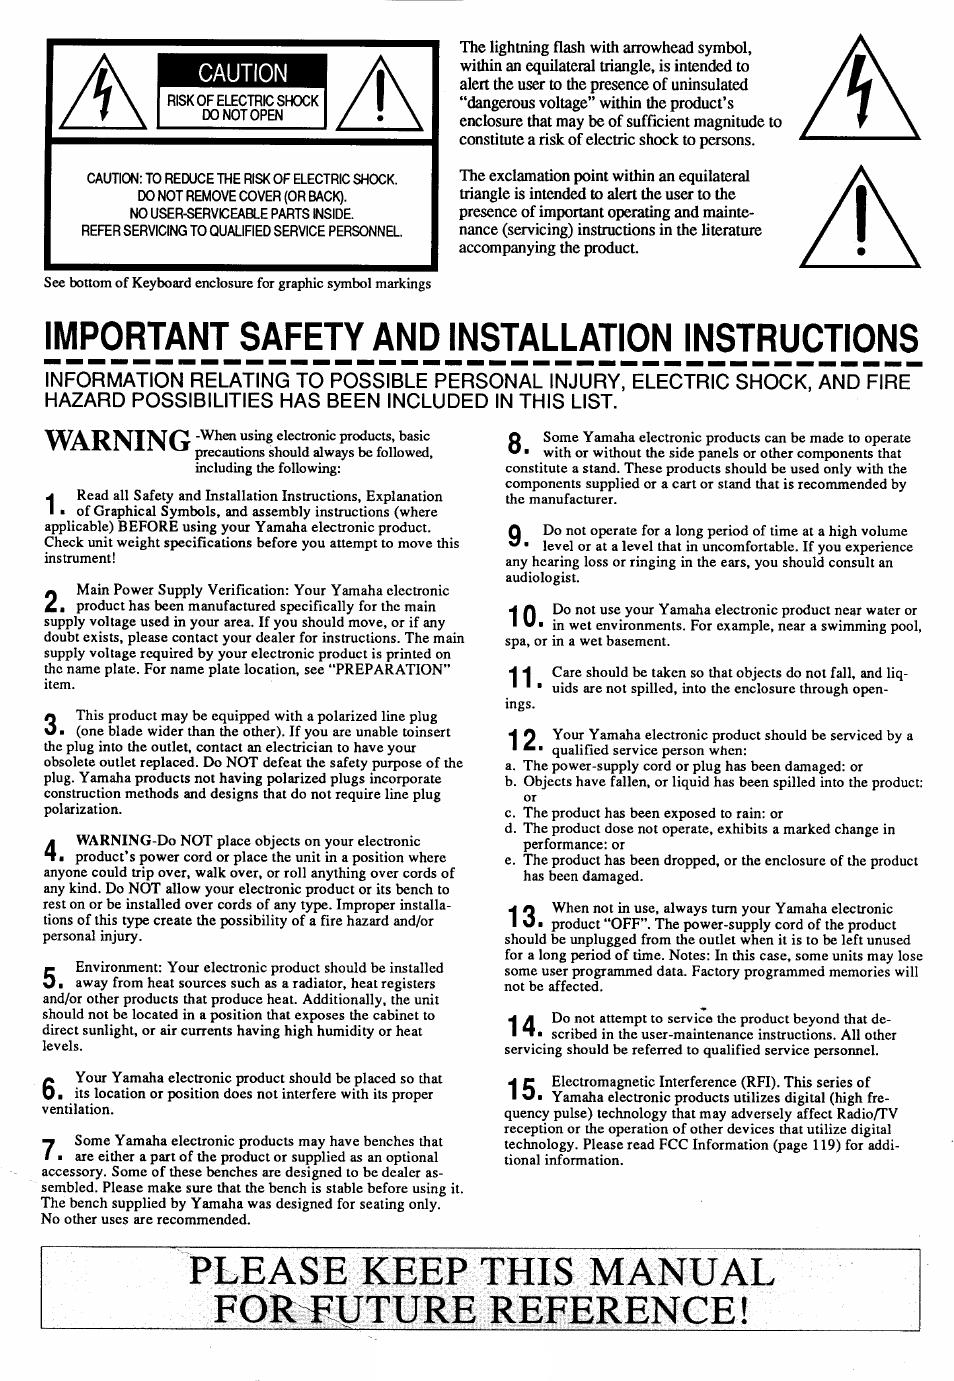 Please keep this manual foreuture reference   Yamaha Clavinova CVP-35  Manuel d'utilisation   Page 2 / 46